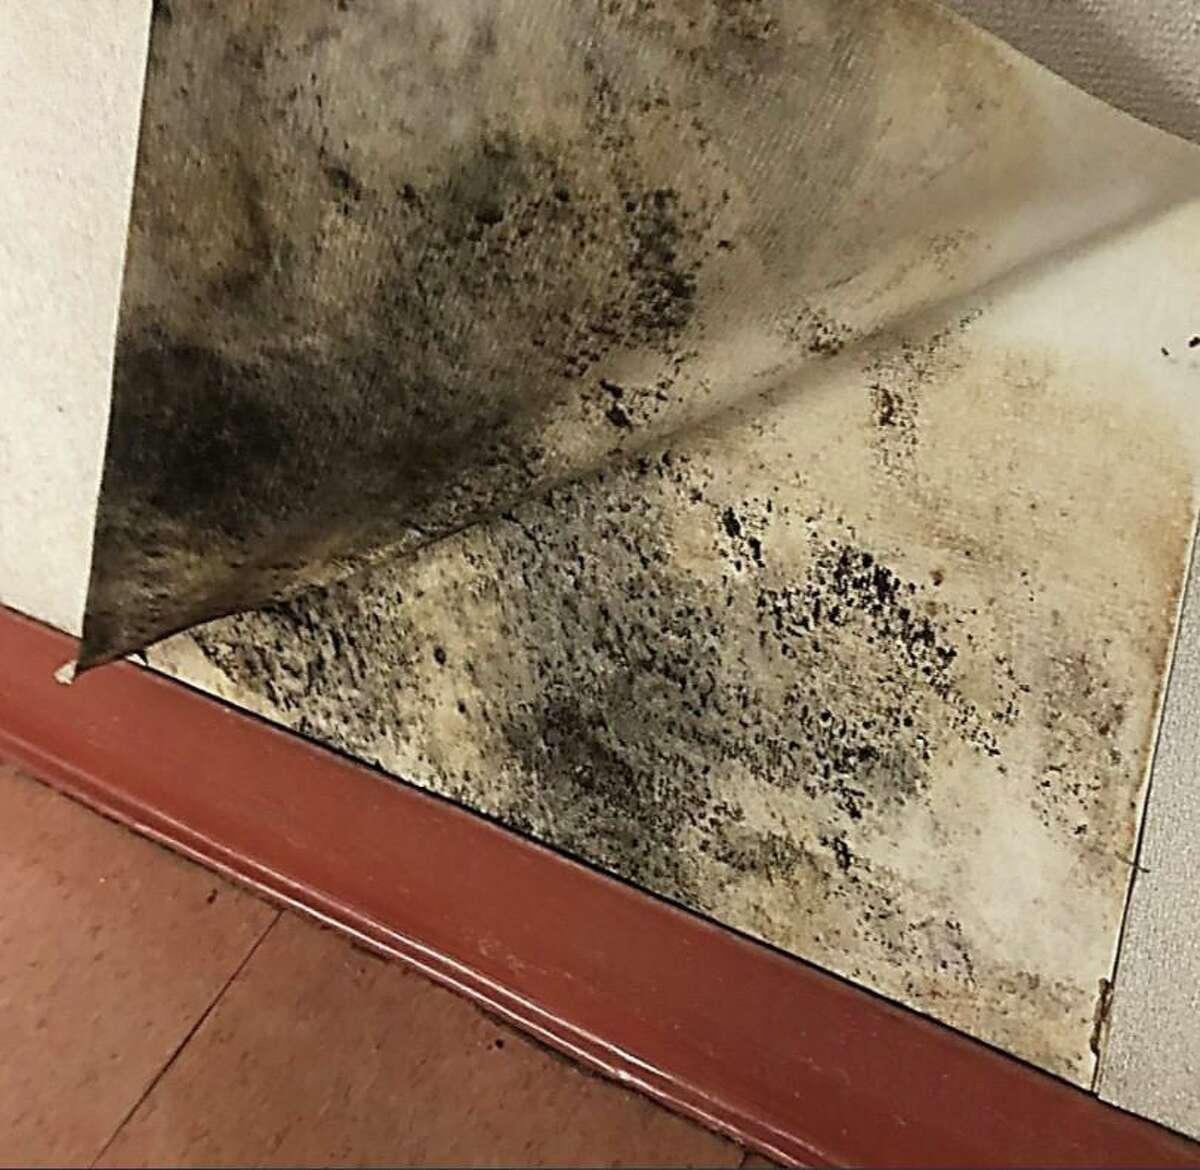 Mold found in Julia A. Stark Elementary School.